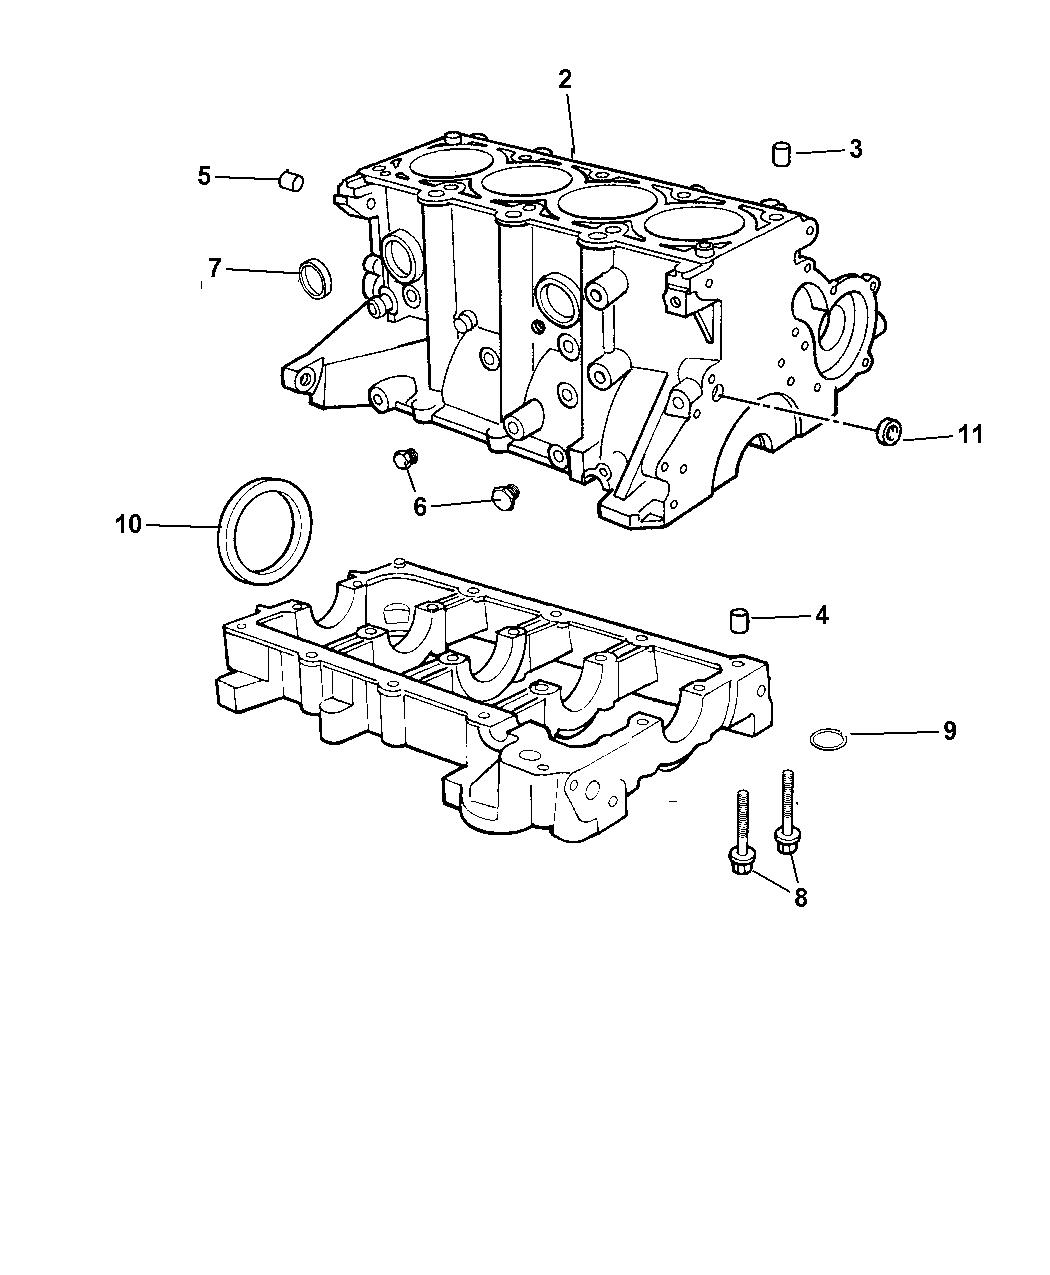 2004 Chrysler PT Cruiser Cylinder Block & Related Parts - Thumbnail 1